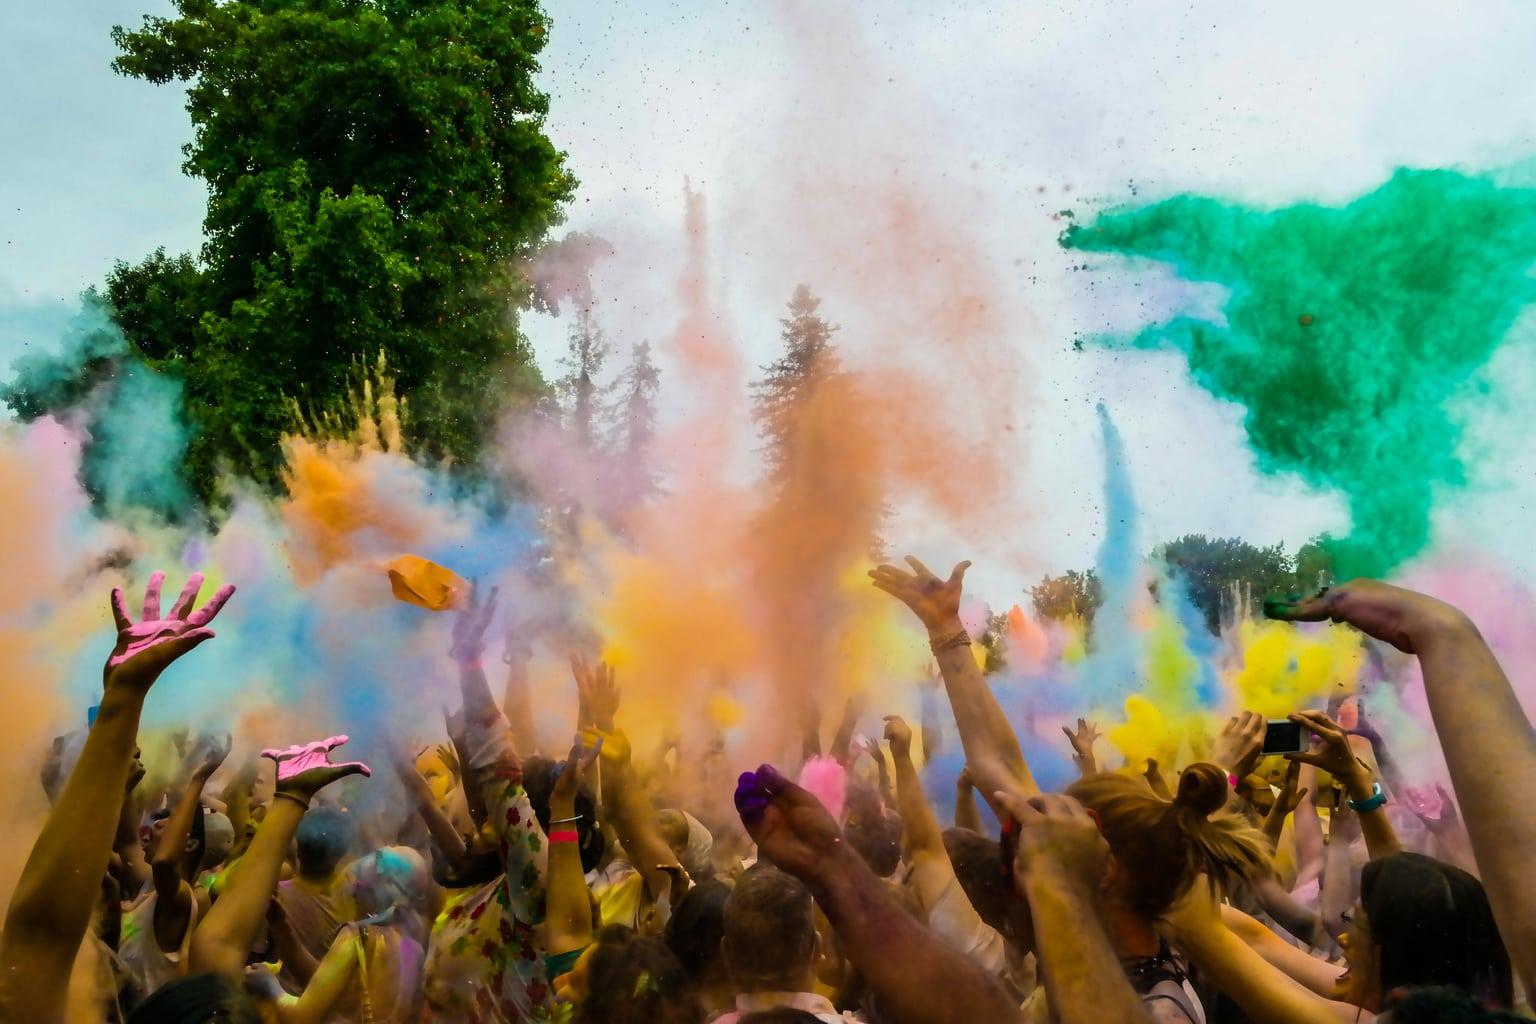 Festivales...